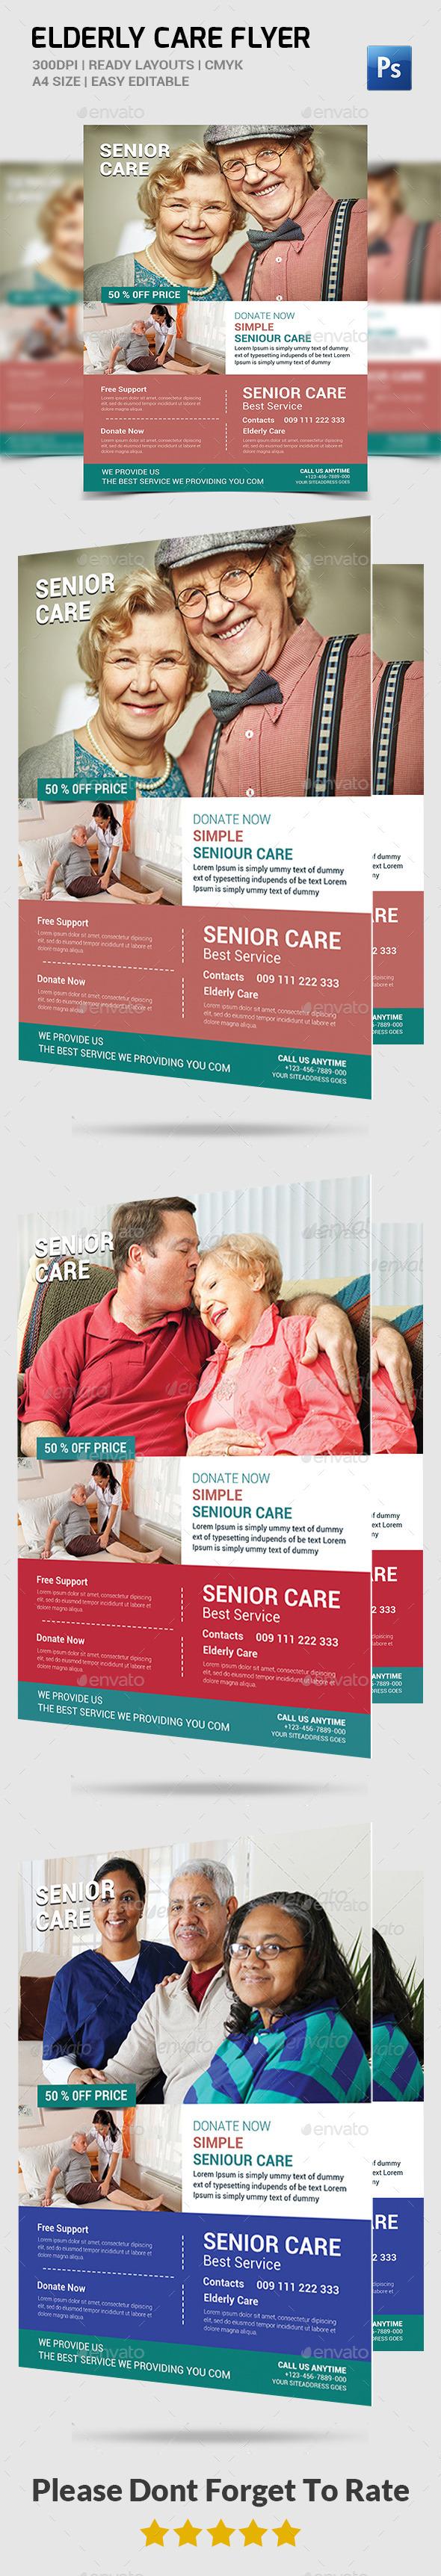 Elderly Care: Flyer Template - Corporate Flyers